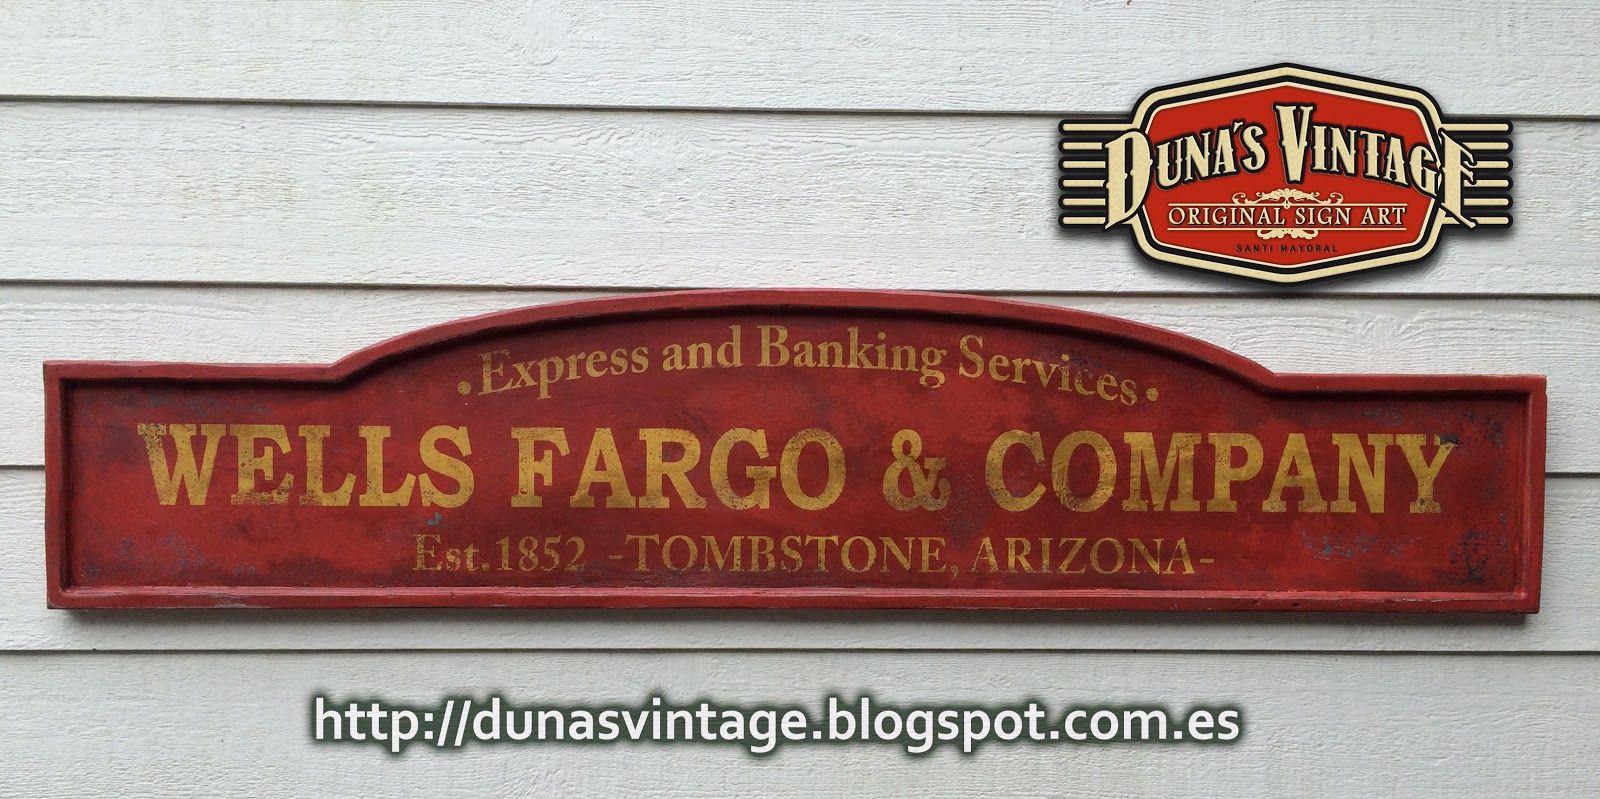 duna s vintage wells fargo u0026 company 1852 duna s vintage duna